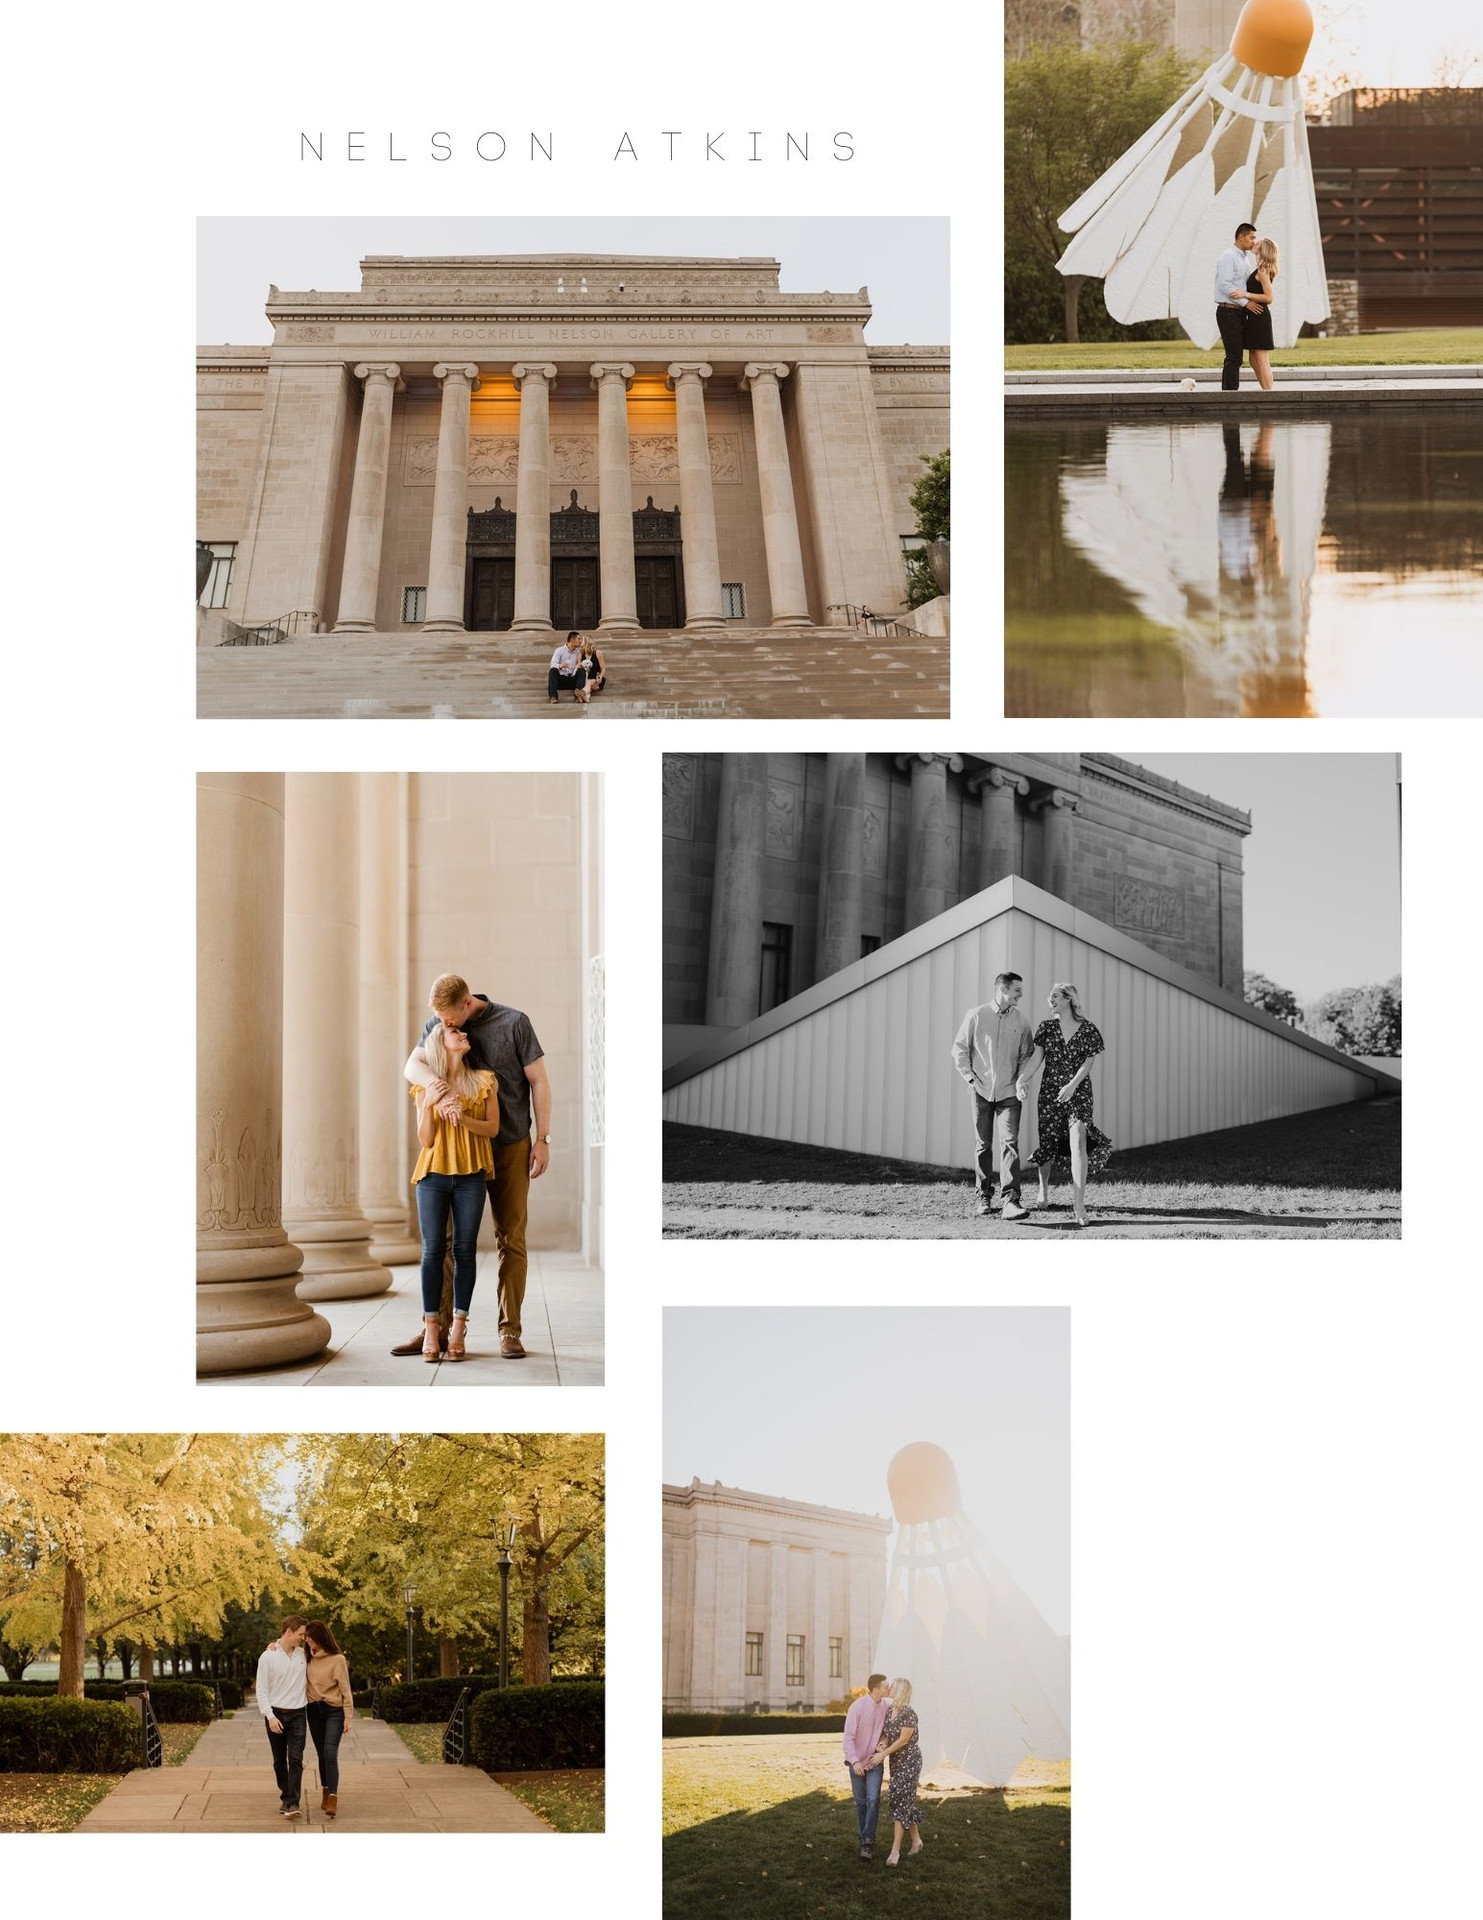 Nelson Atkins Museum.jpg